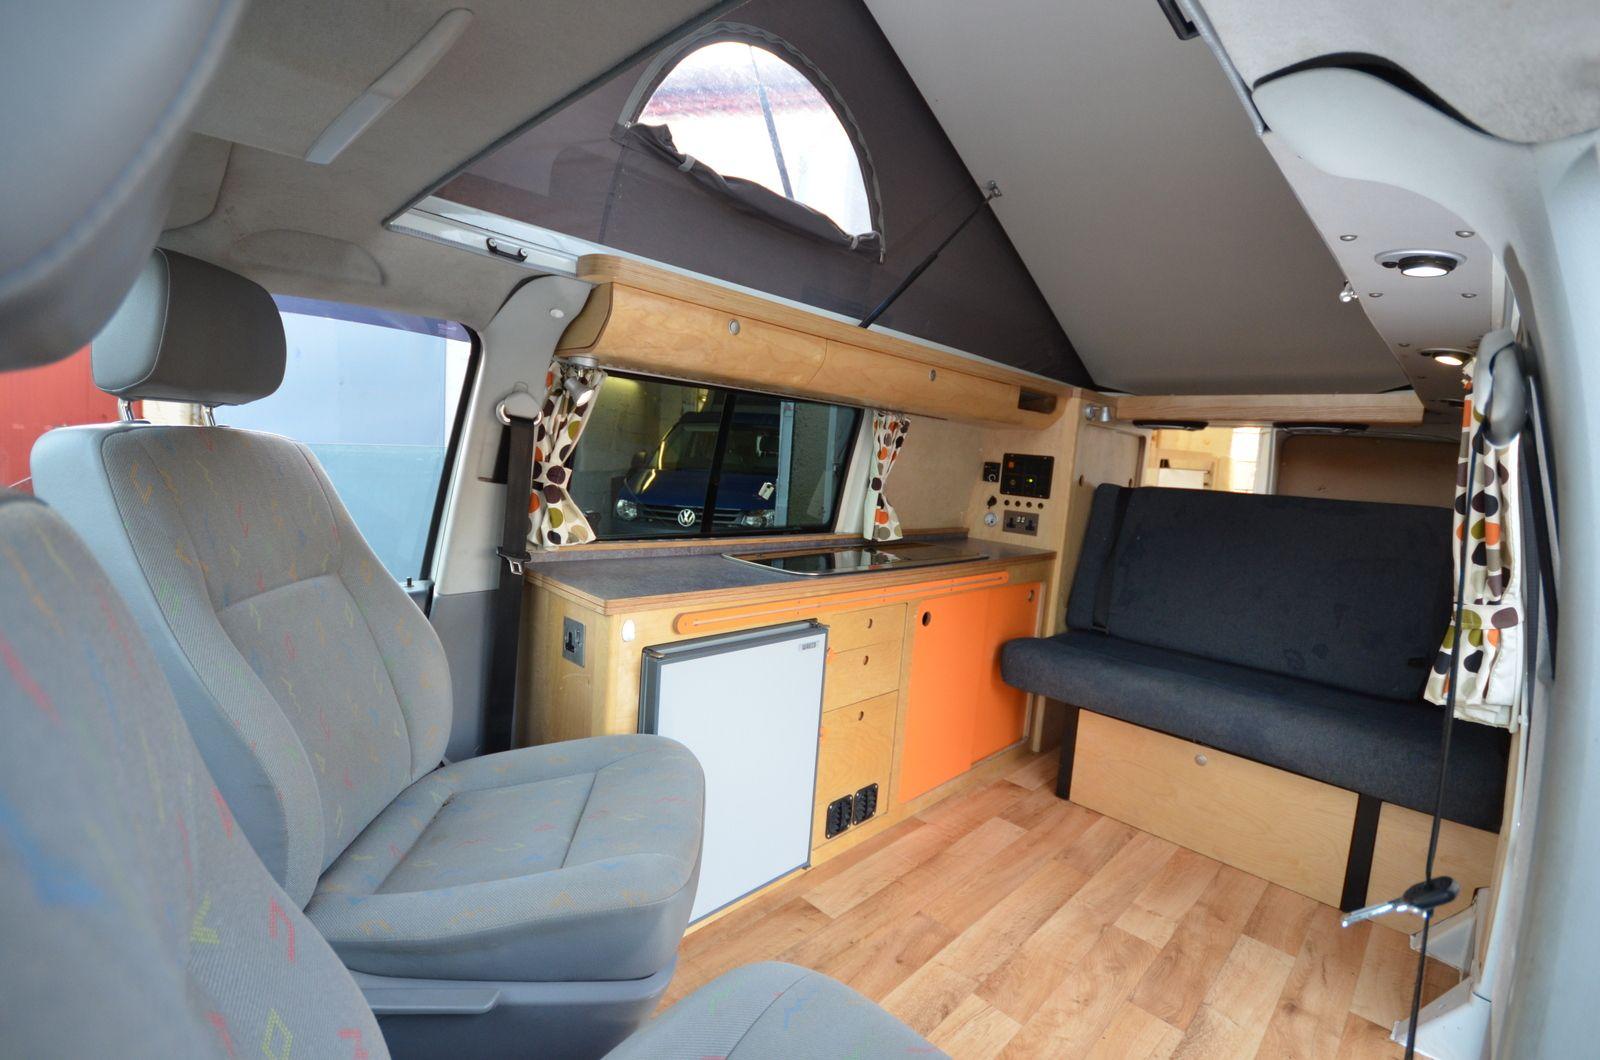 Our First Lwb T5 Camper Conversion Van Interior Campervan Interior Camper Conversion